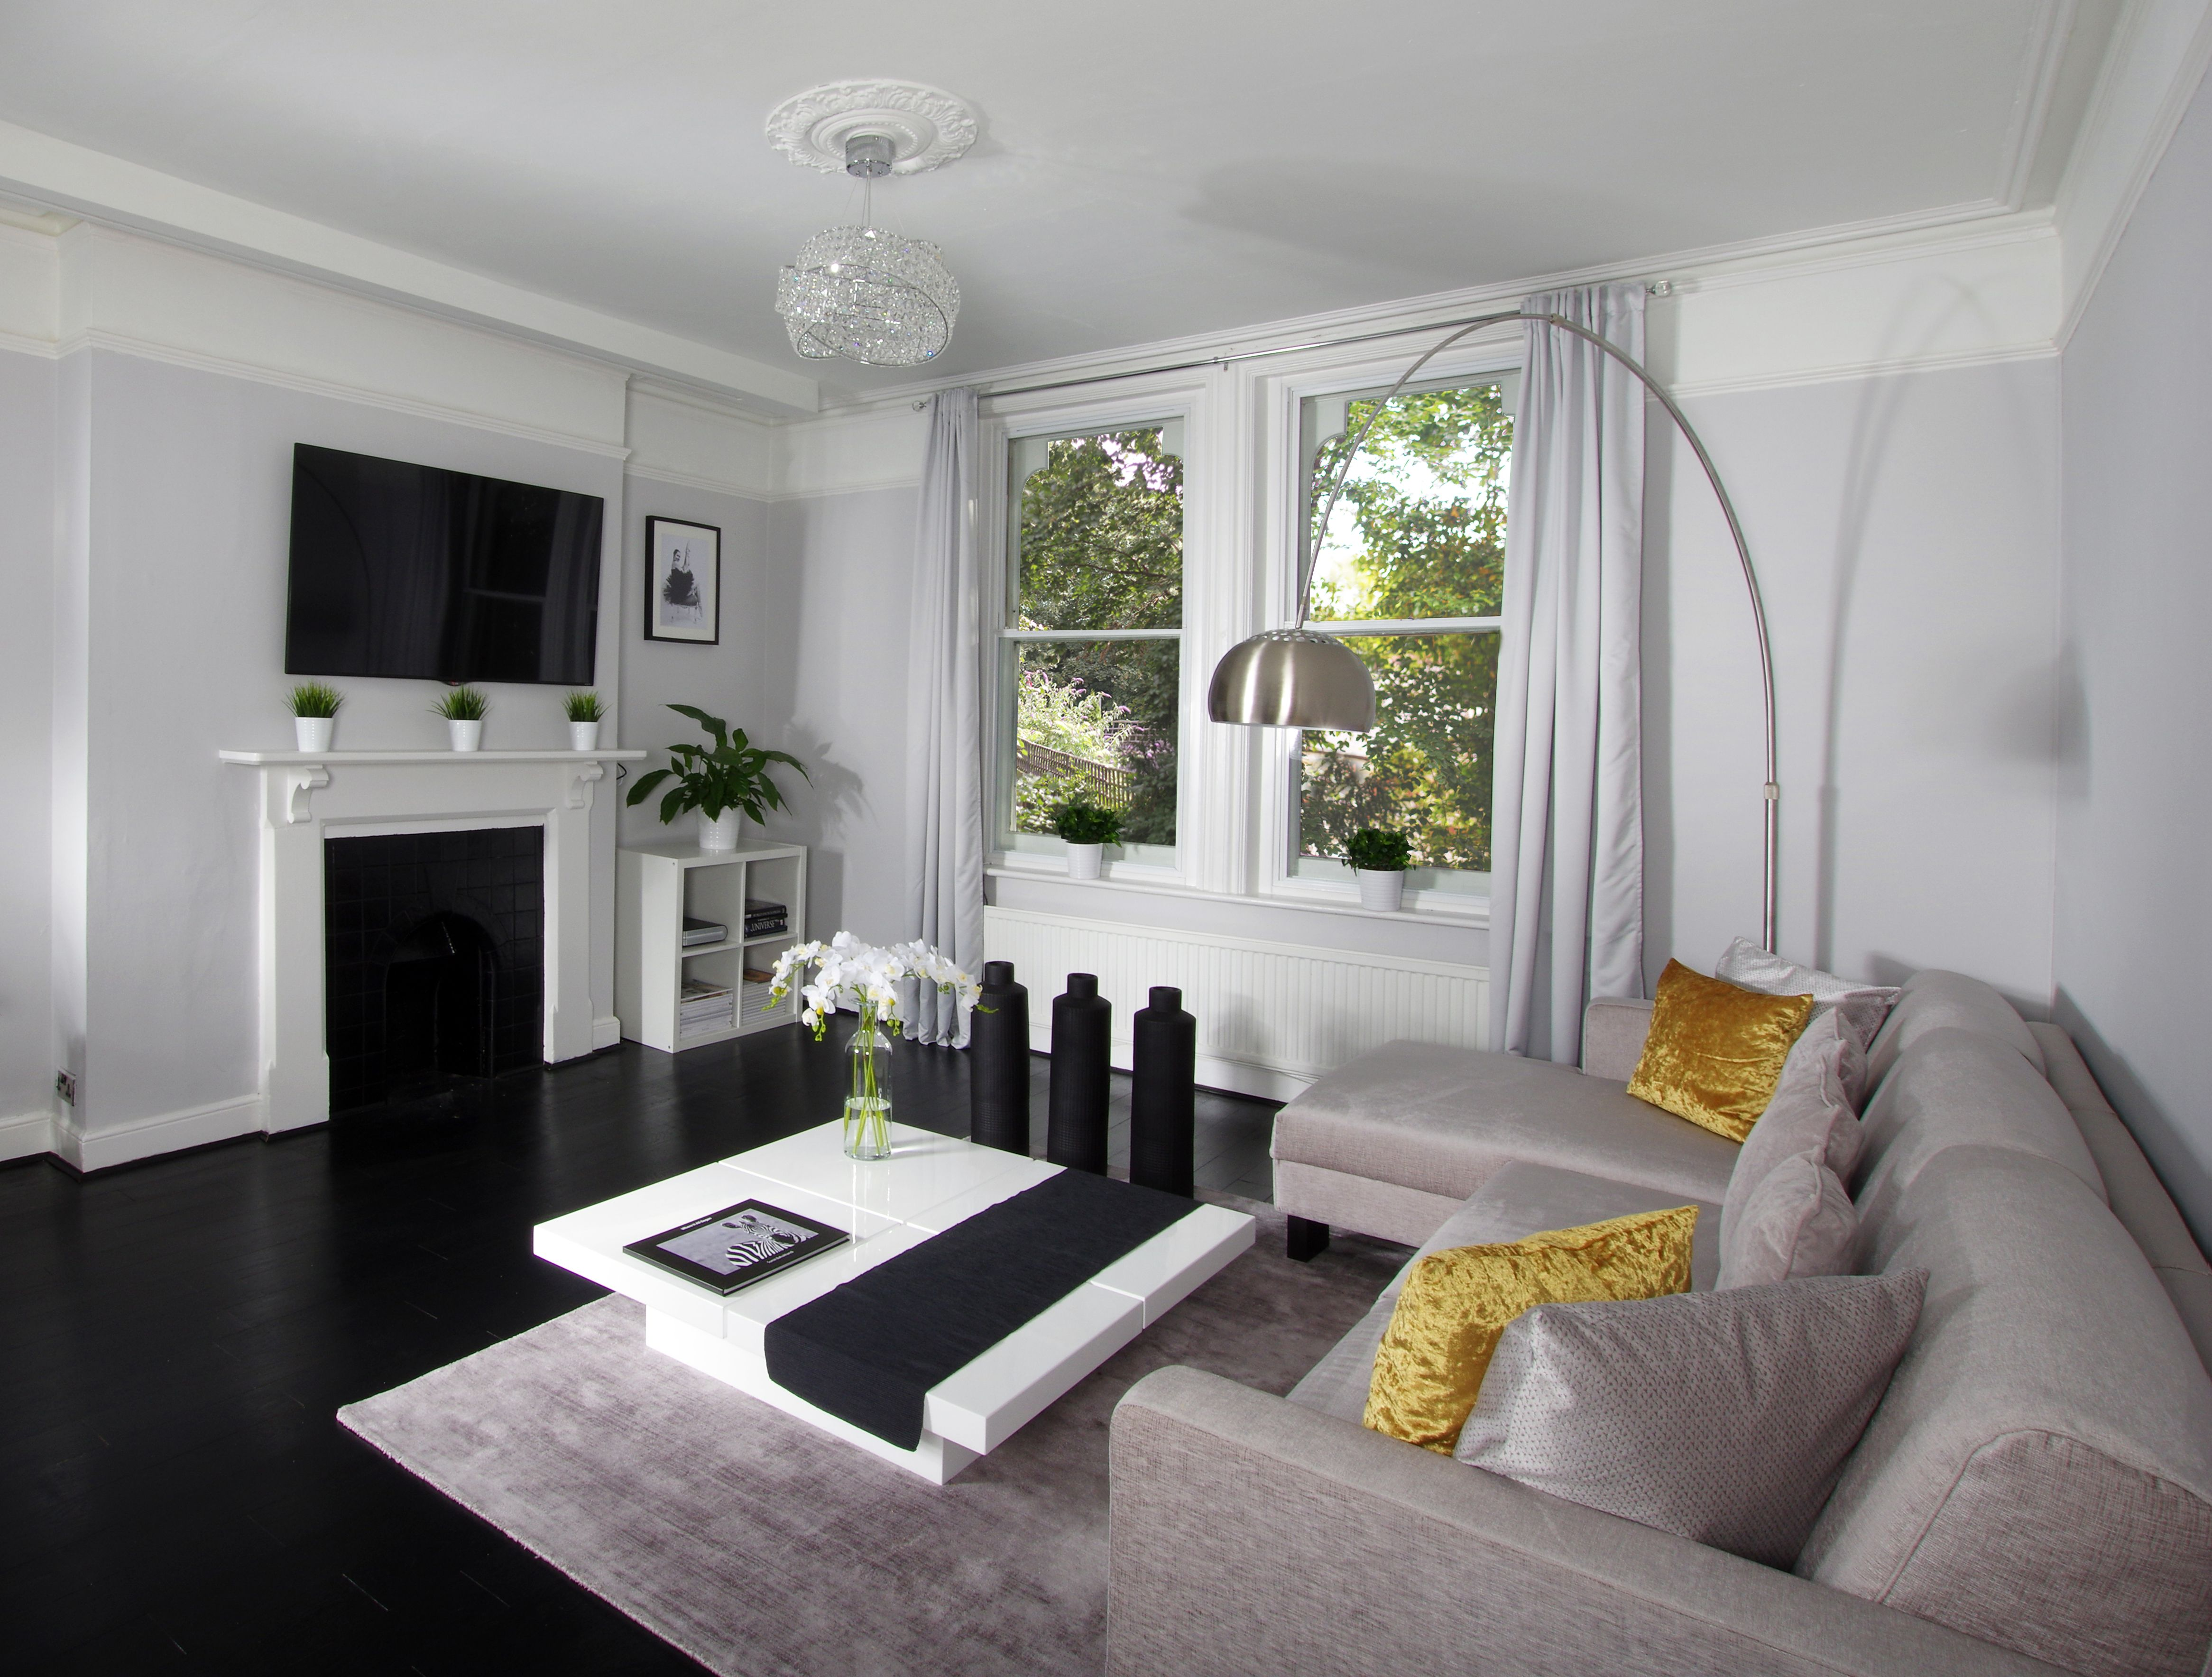 living room at Summerhill Villas designed be Ti Designe  http://www.houzz.co.uk/photos/62115214/summerhill-villas-living-room-contemporary-living-room-london